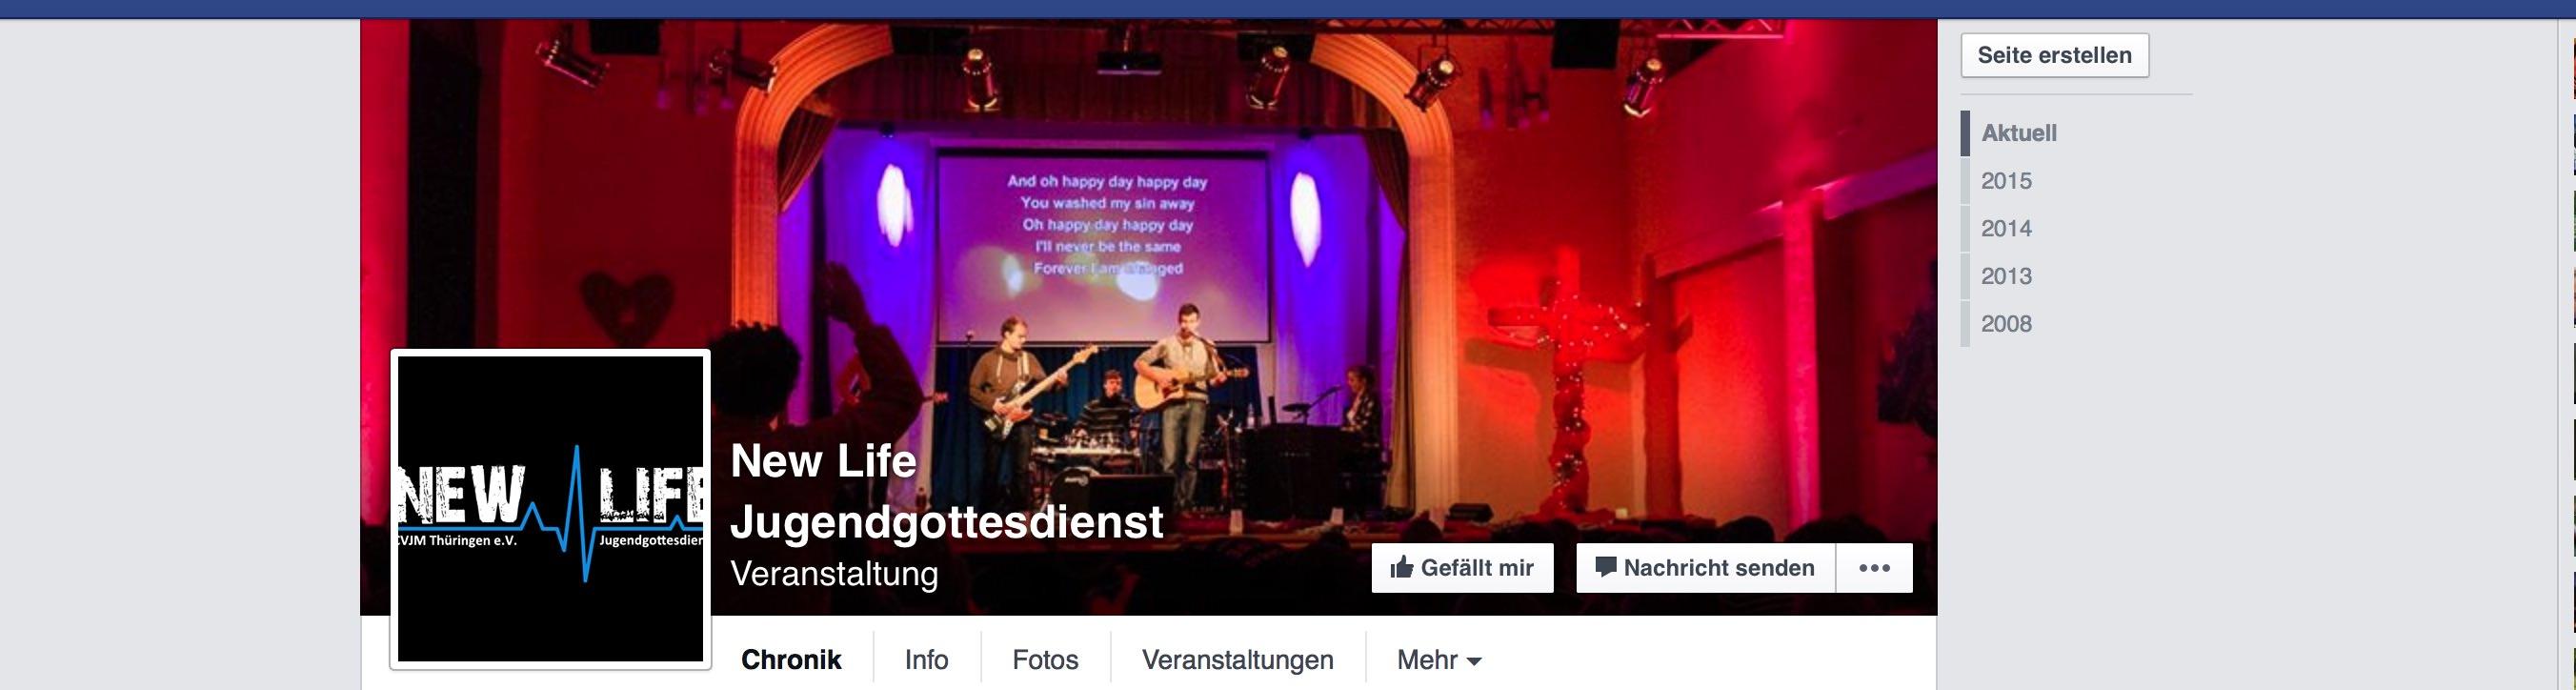 newlife facebook